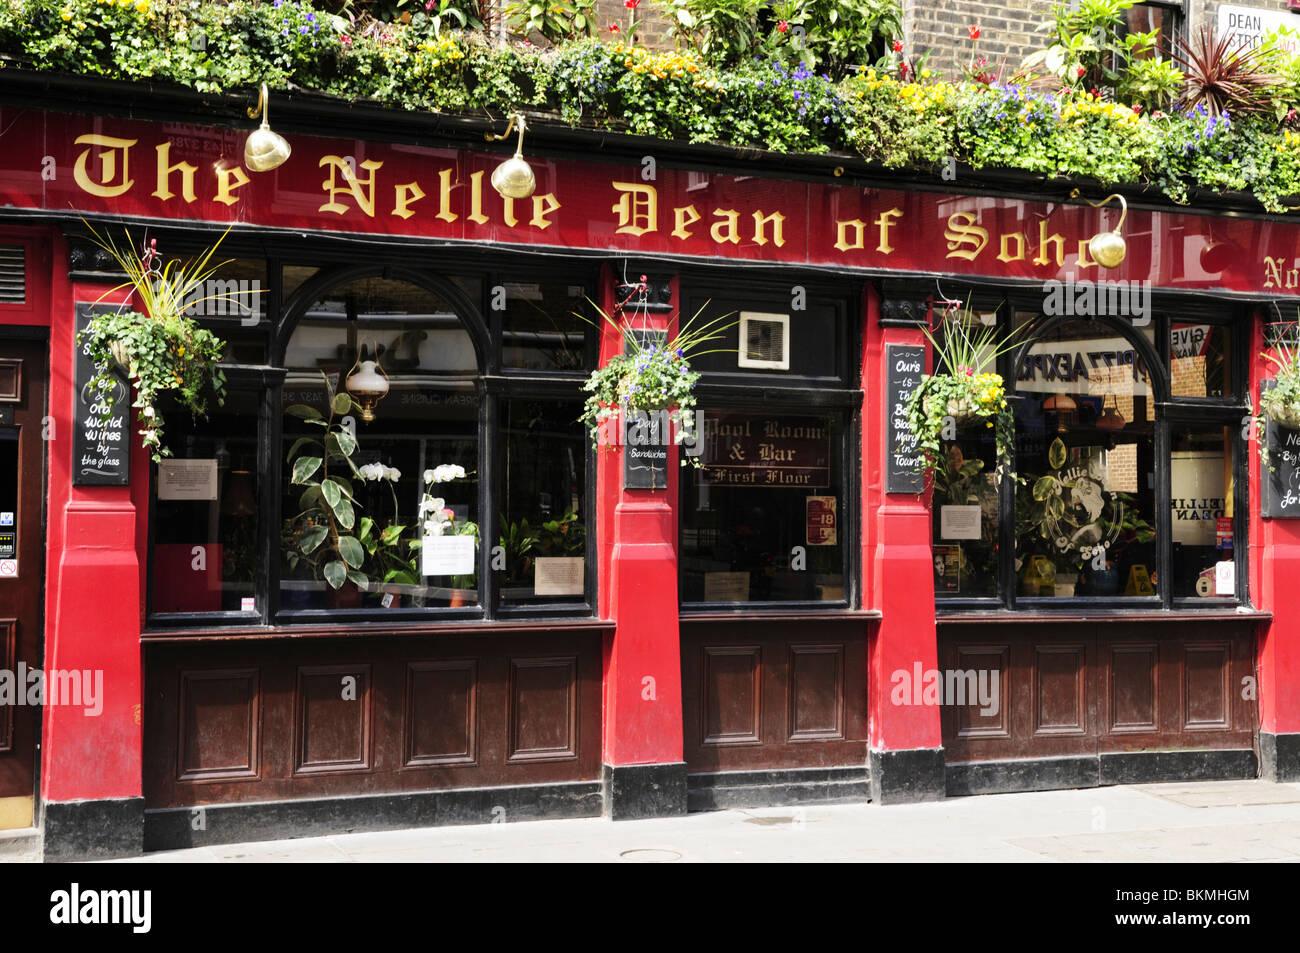 The Nellie Dean of Soho Pub in Dean Street, Soho, London, England, UK - Stock Image